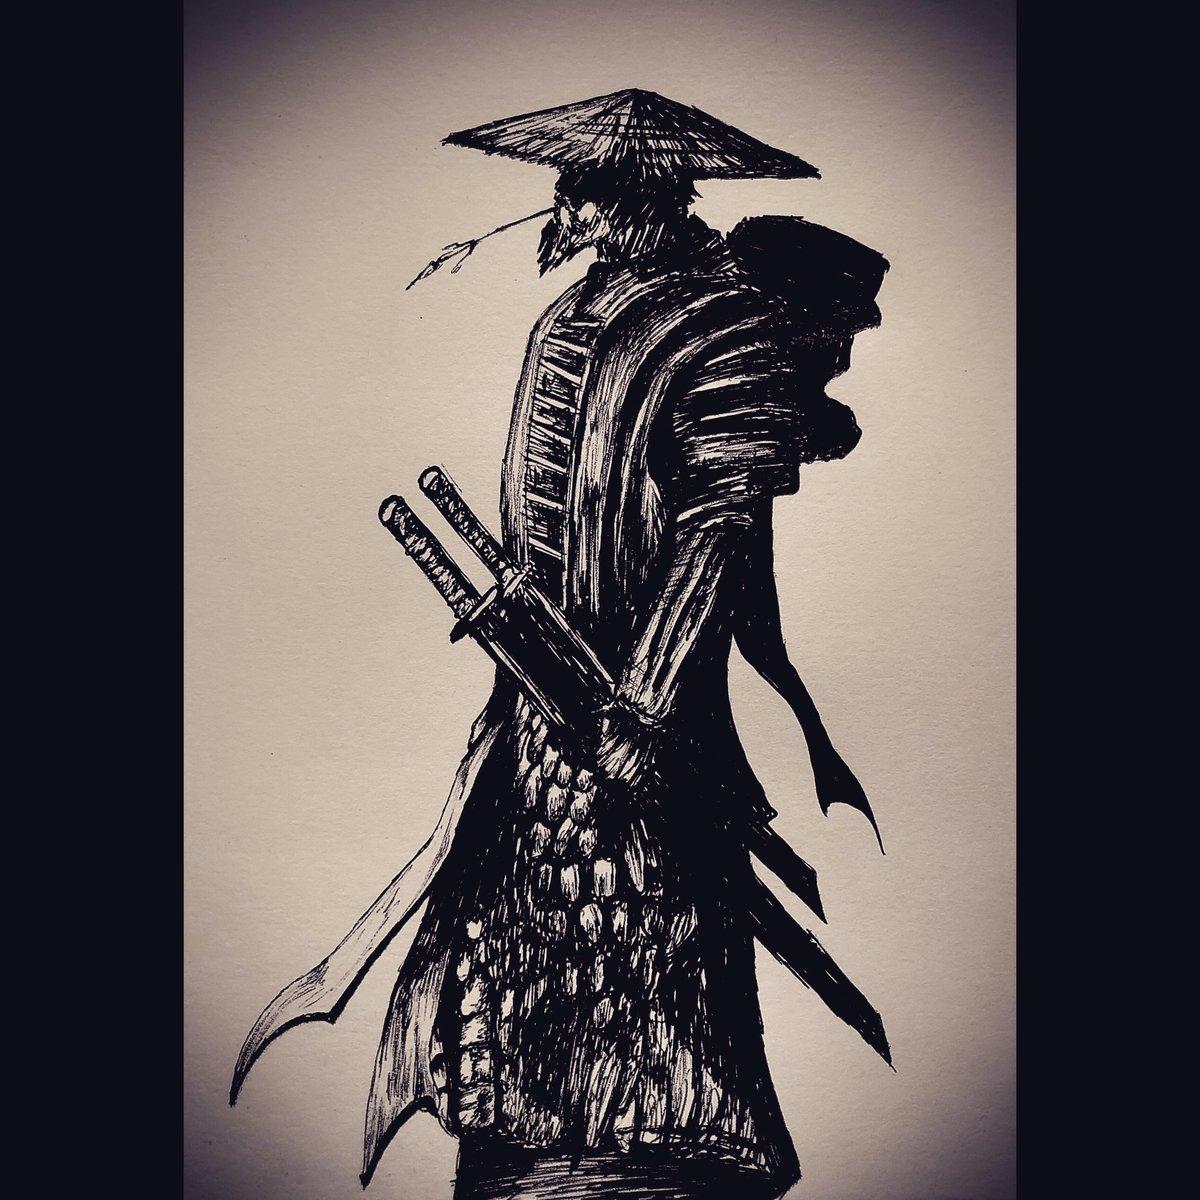 Japanese Samurai, artist/BlackTiger_7, black pen, 2020